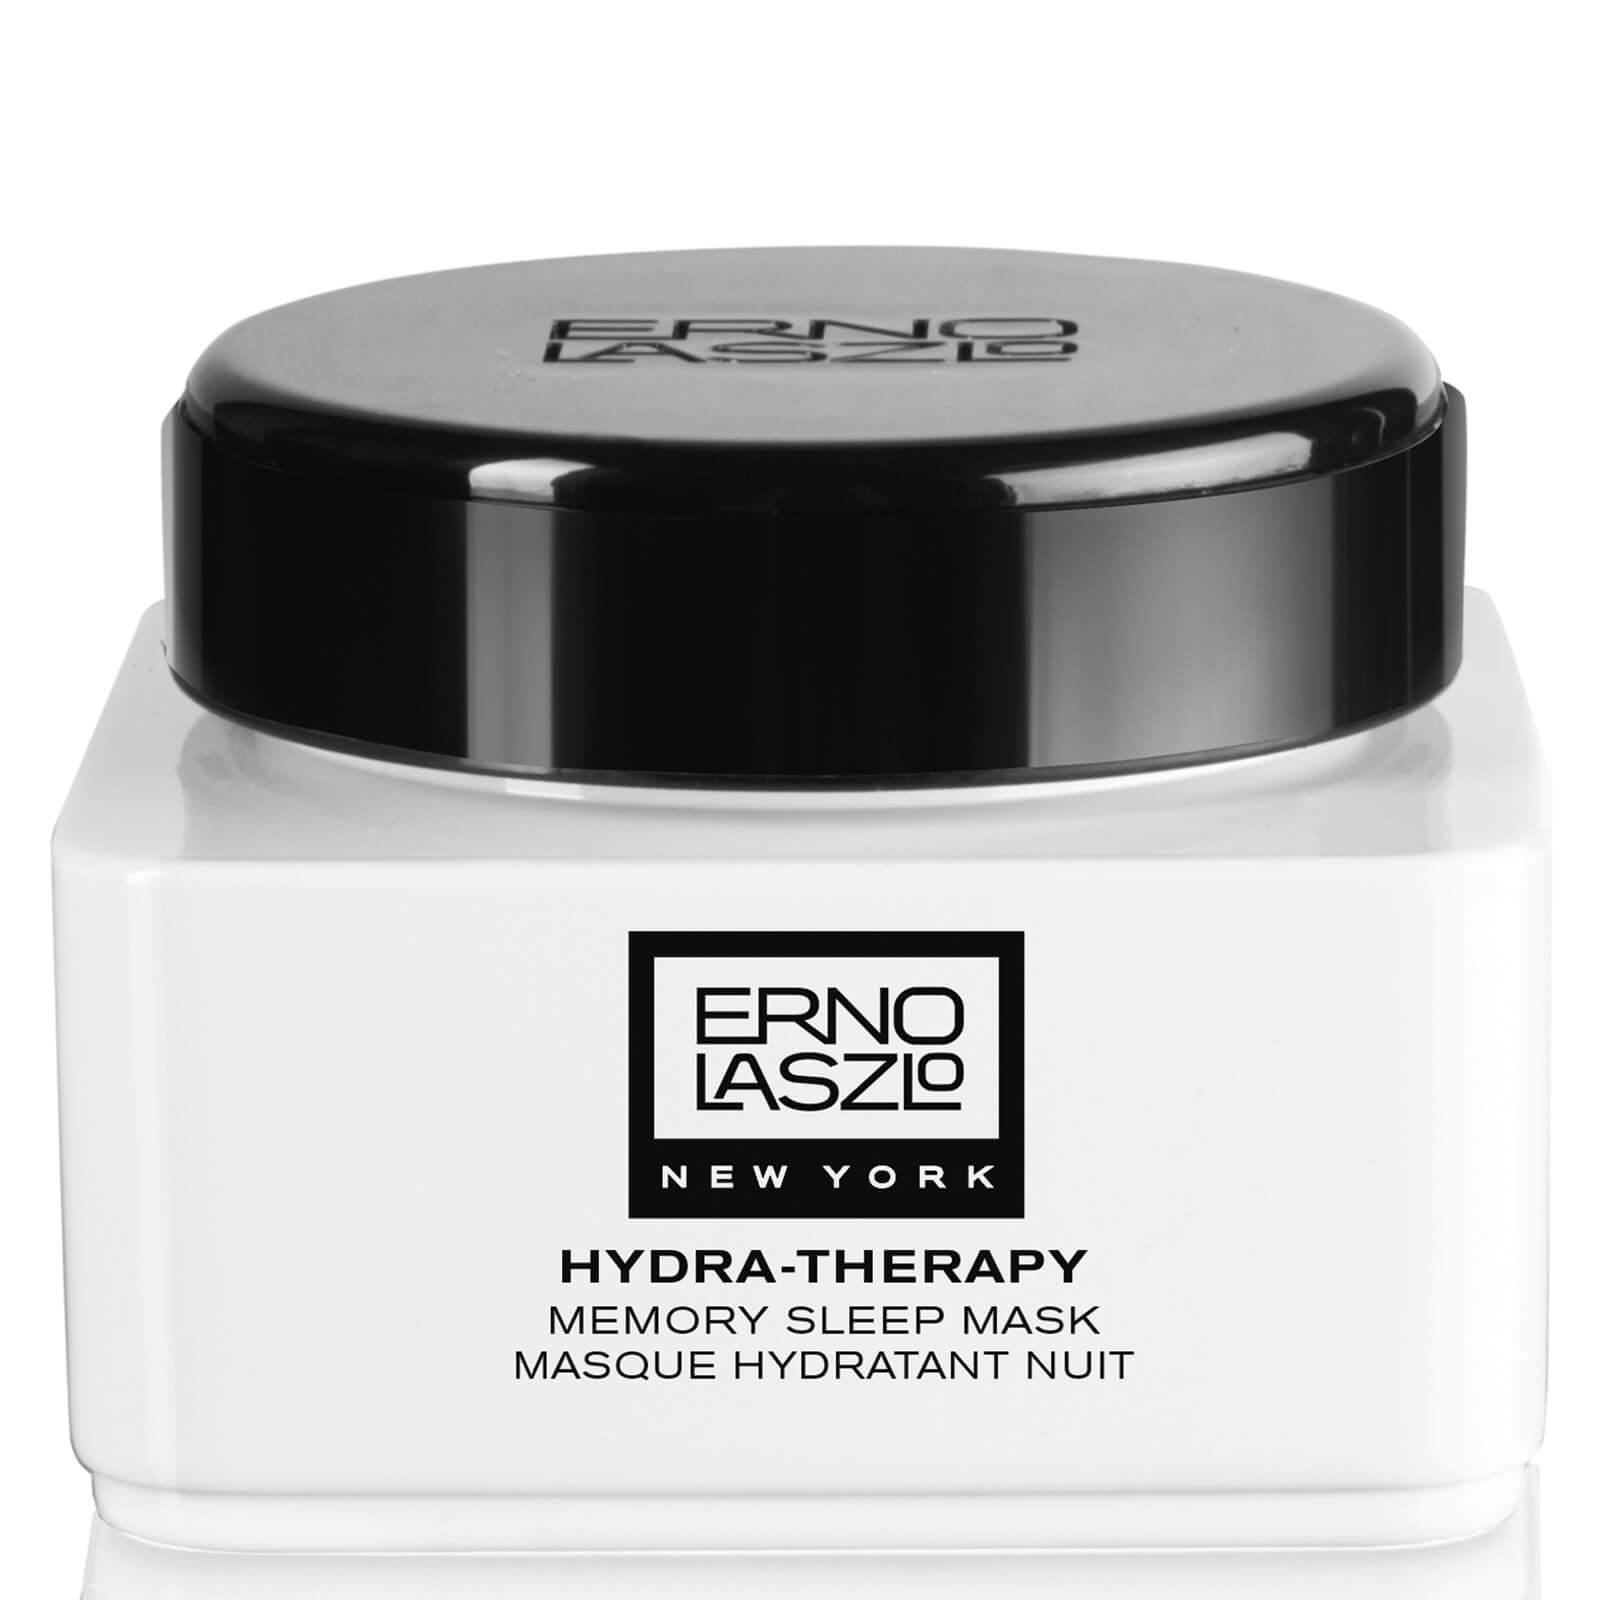 Erno Laszlo HydraTherapy Memory Sleep Mask (40g) | Lookfantastic UAE